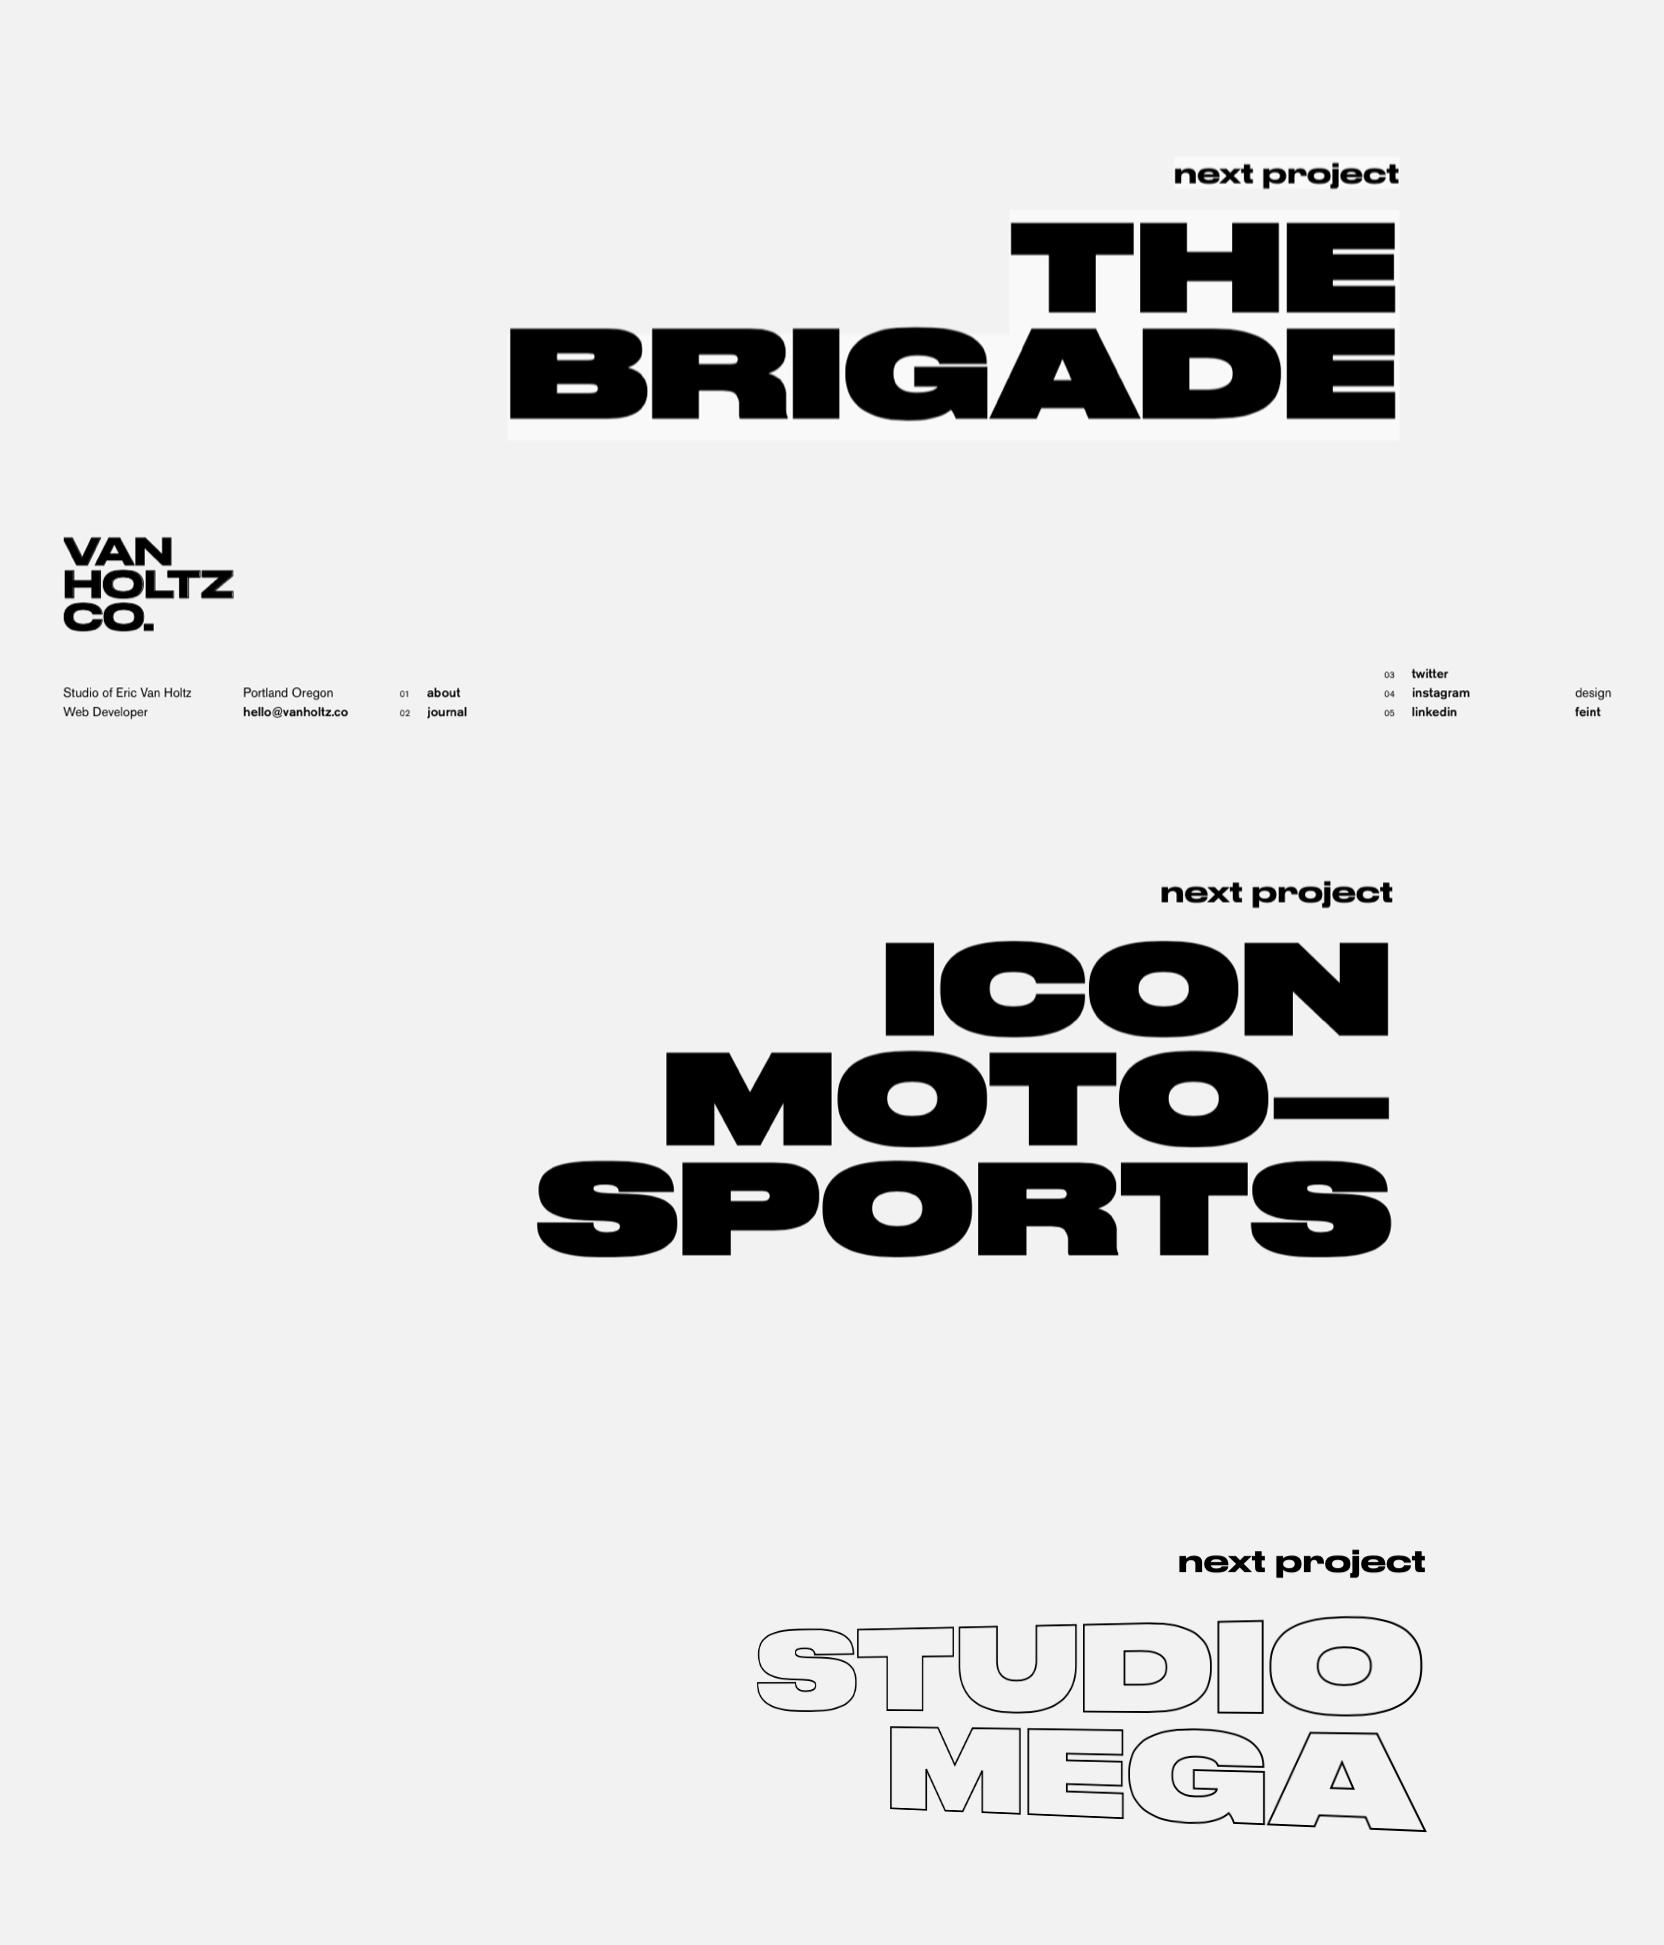 Pin By Nick Herasimenka On Typography Pinterest Typography